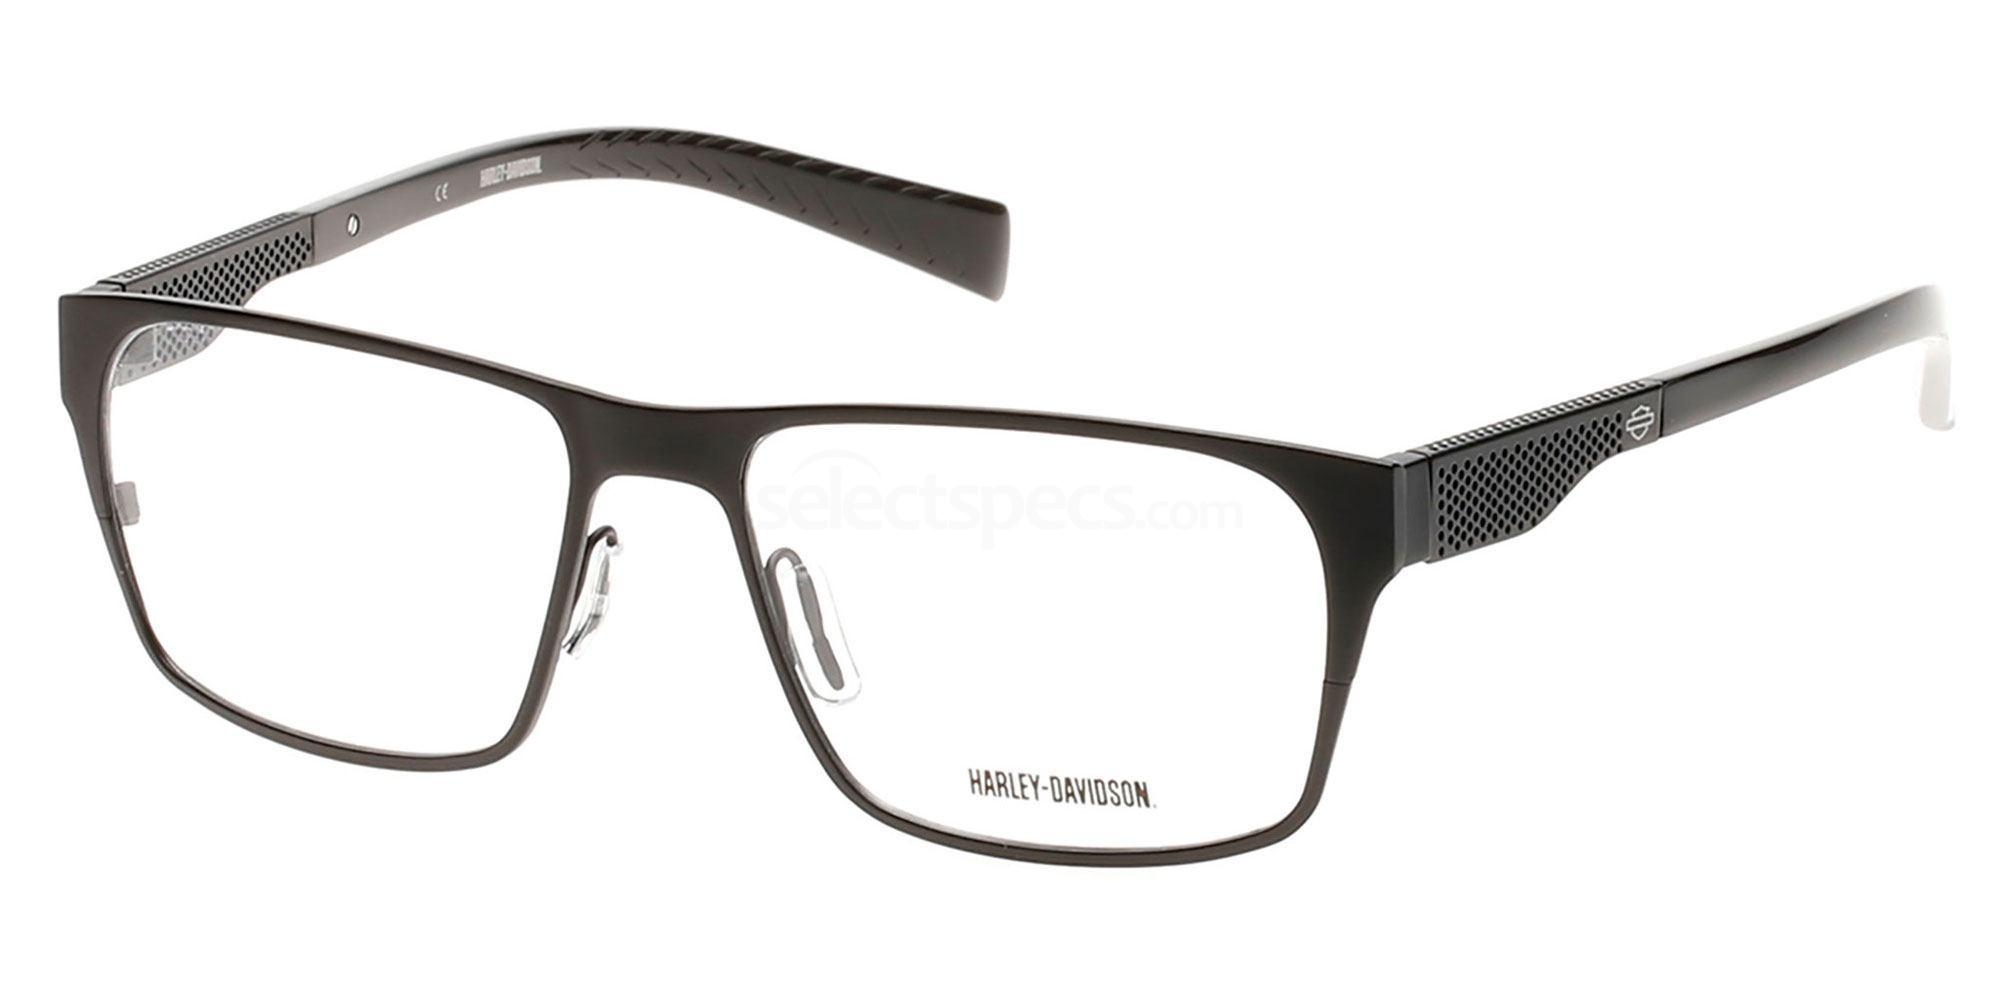 001 HD 1005 Glasses, Harley Davidson